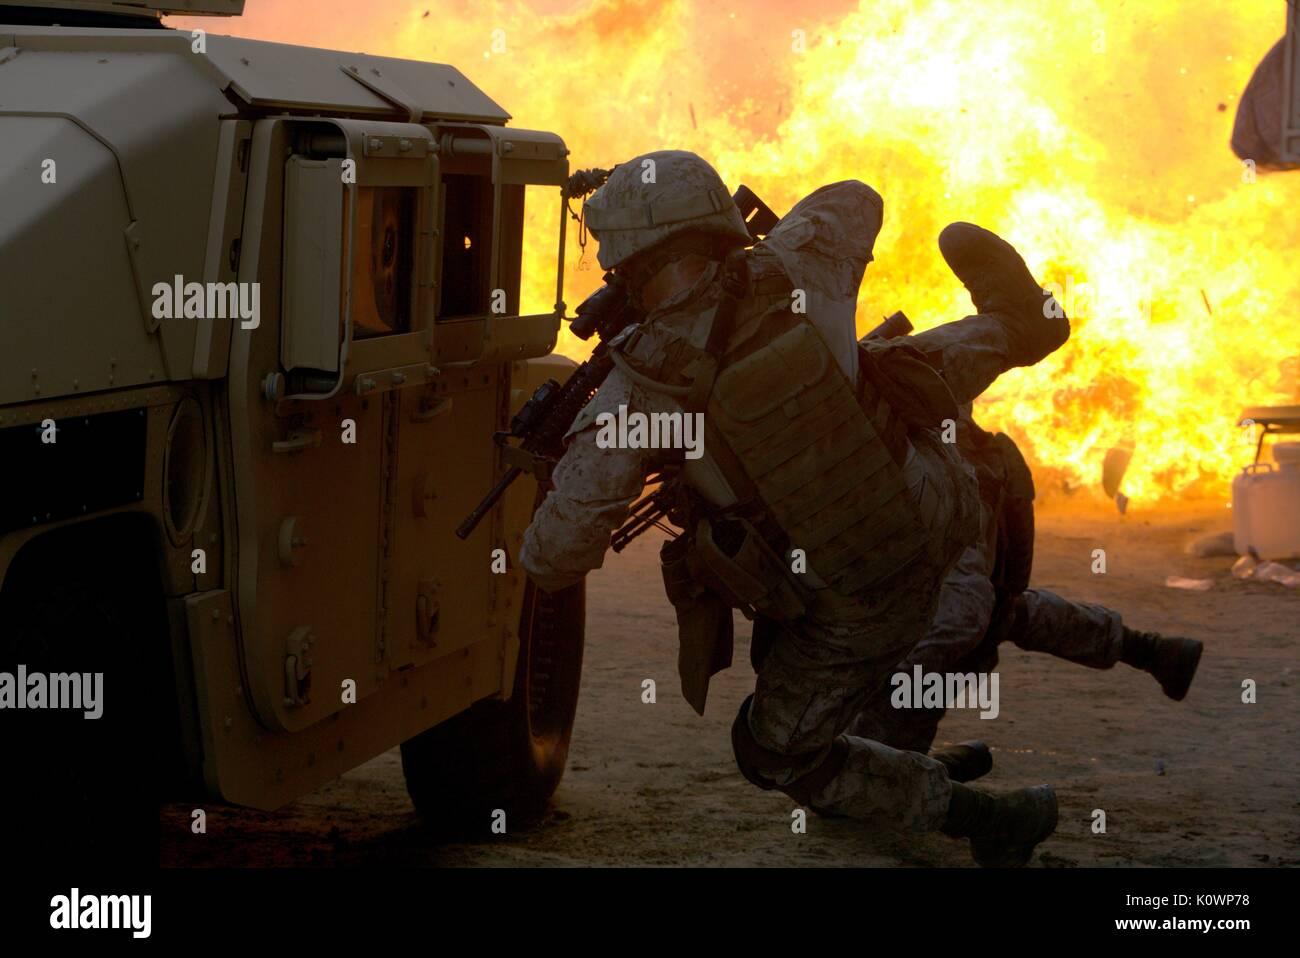 EXPLOSION SCENE MAN DOWN (2015) - Stock Image